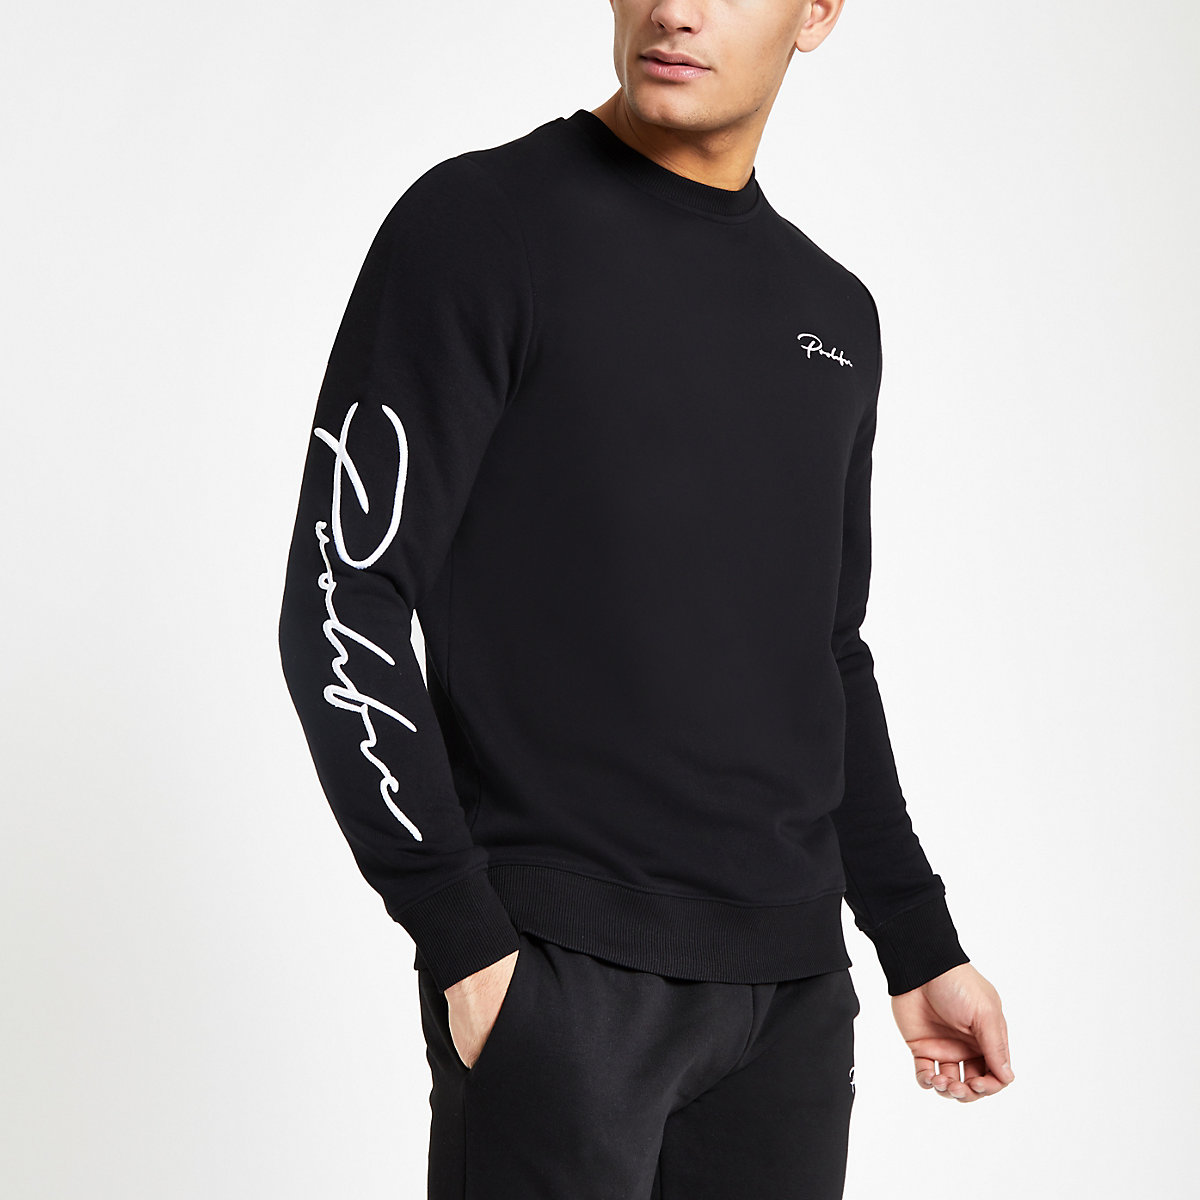 Black 'Prolific' slim fit sweatshirt